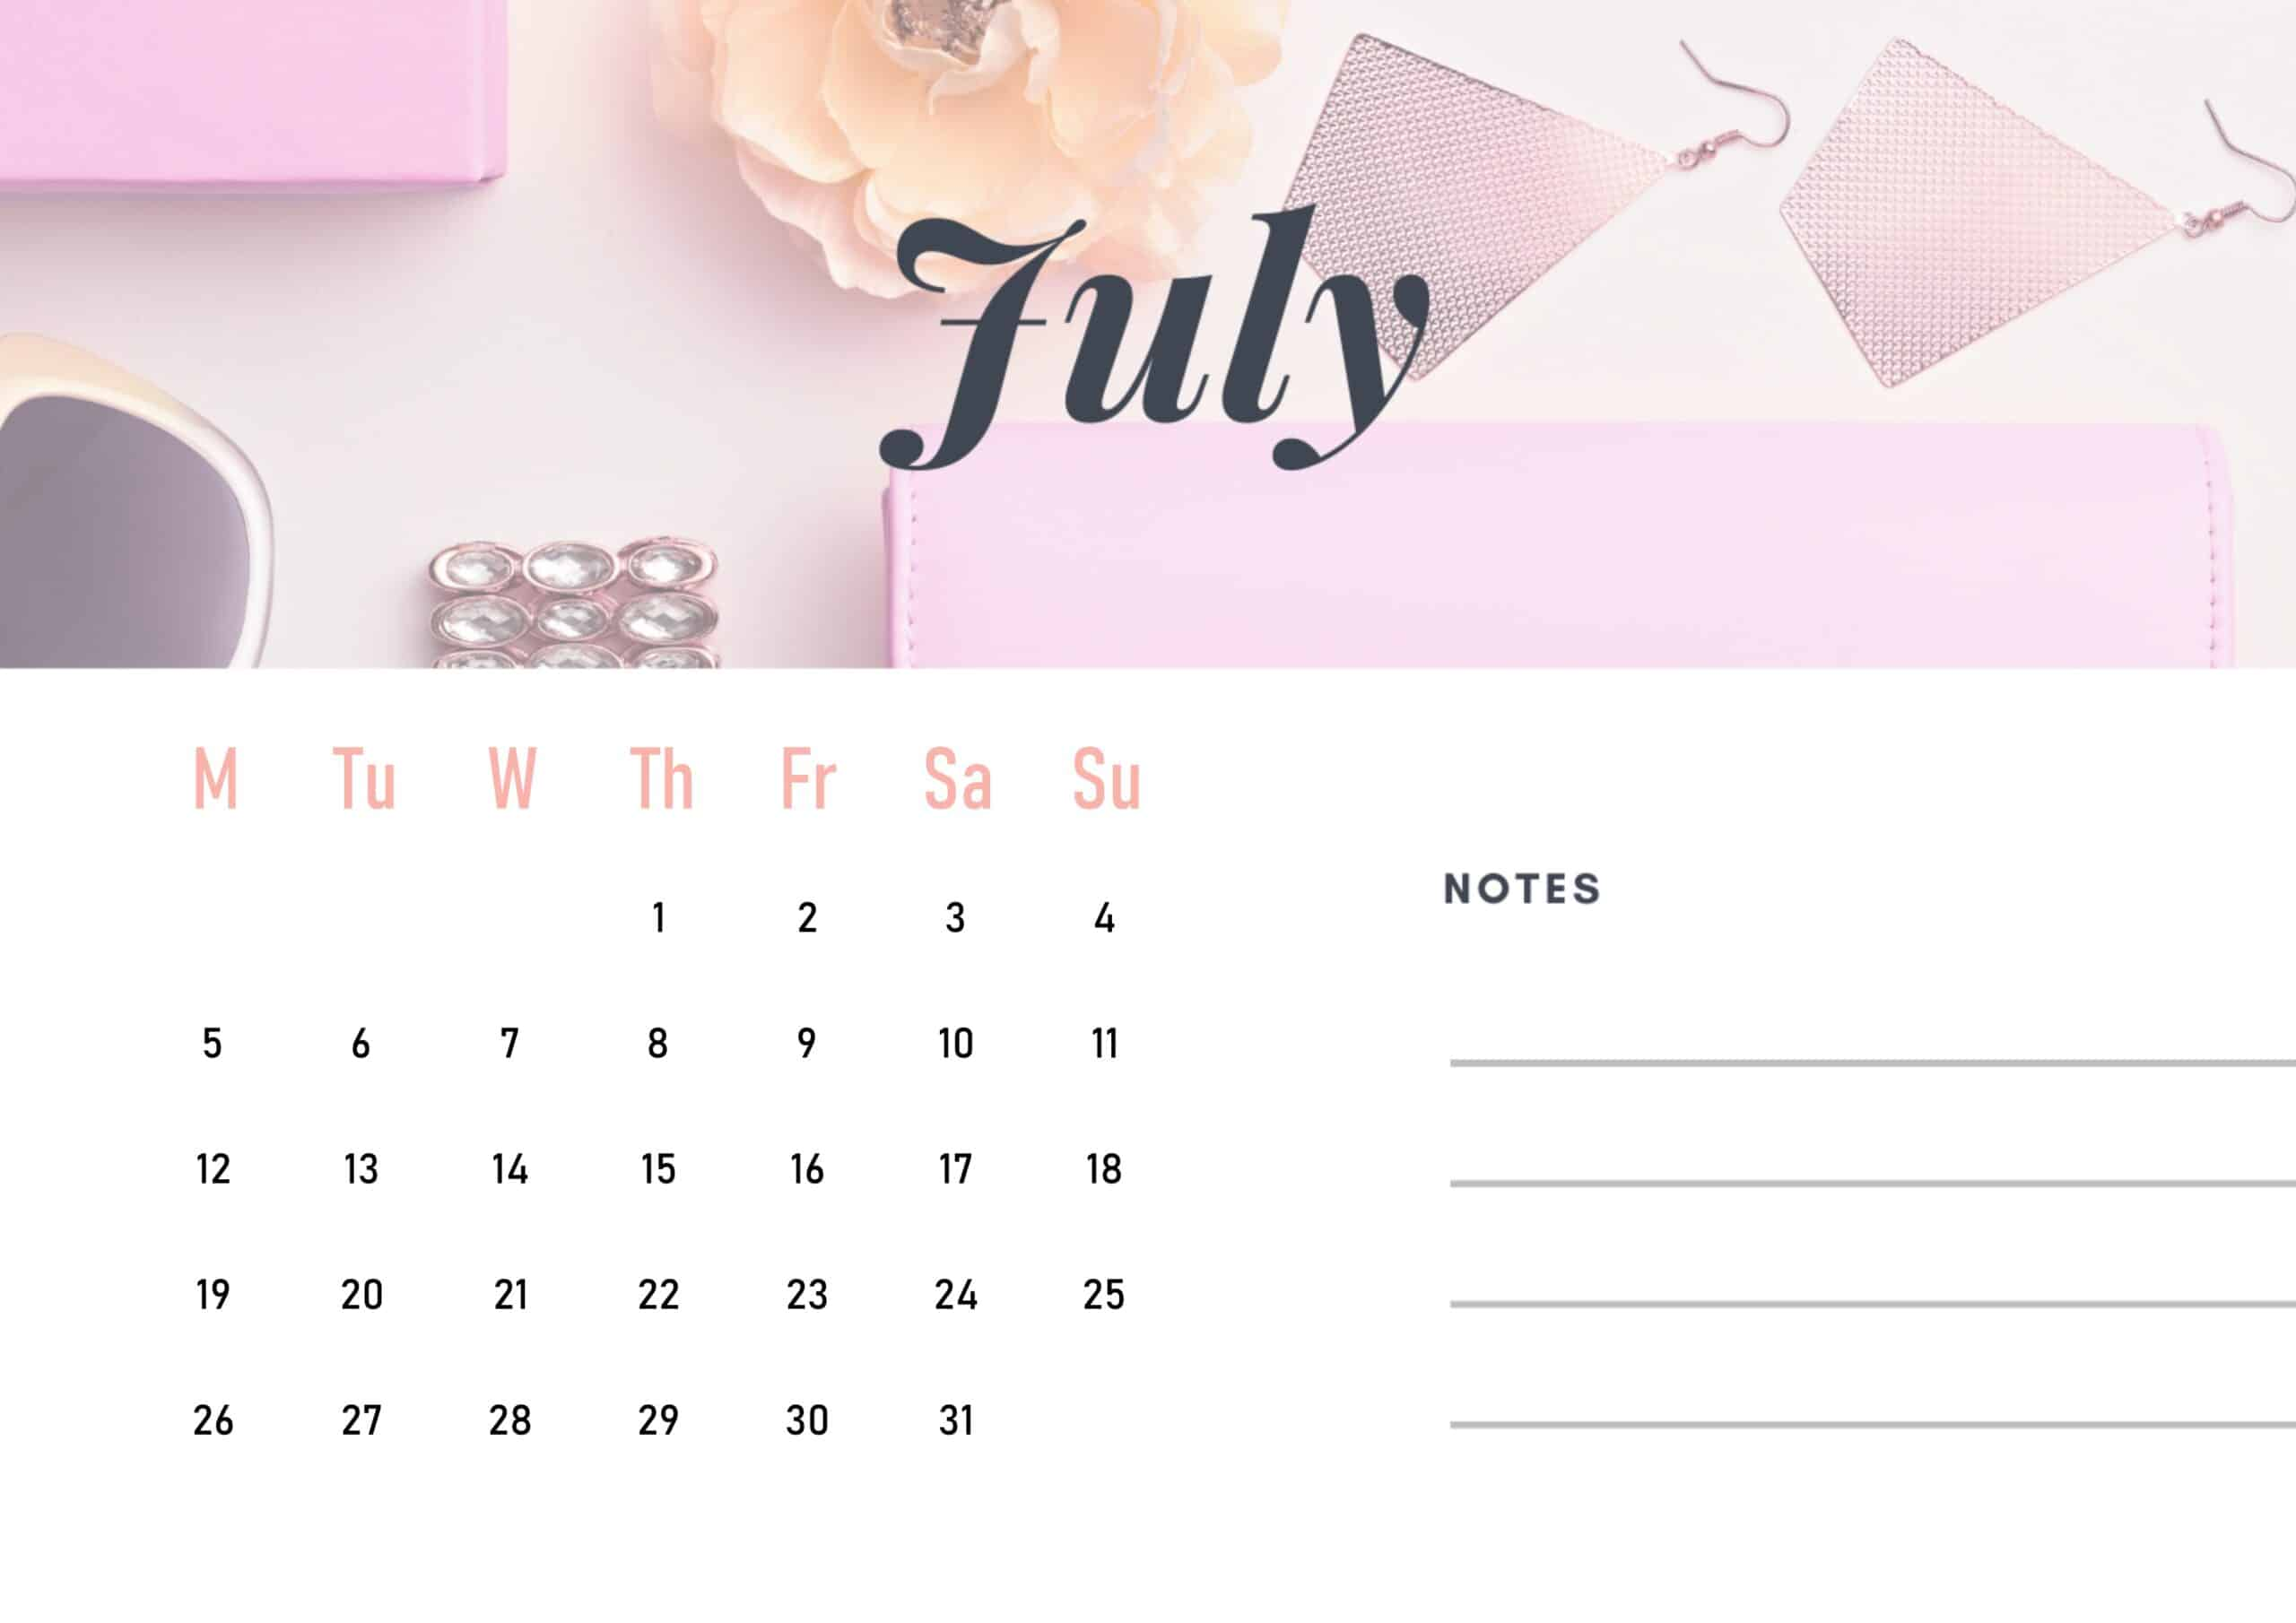 Cute July 2021 Calendar Wallpaper download